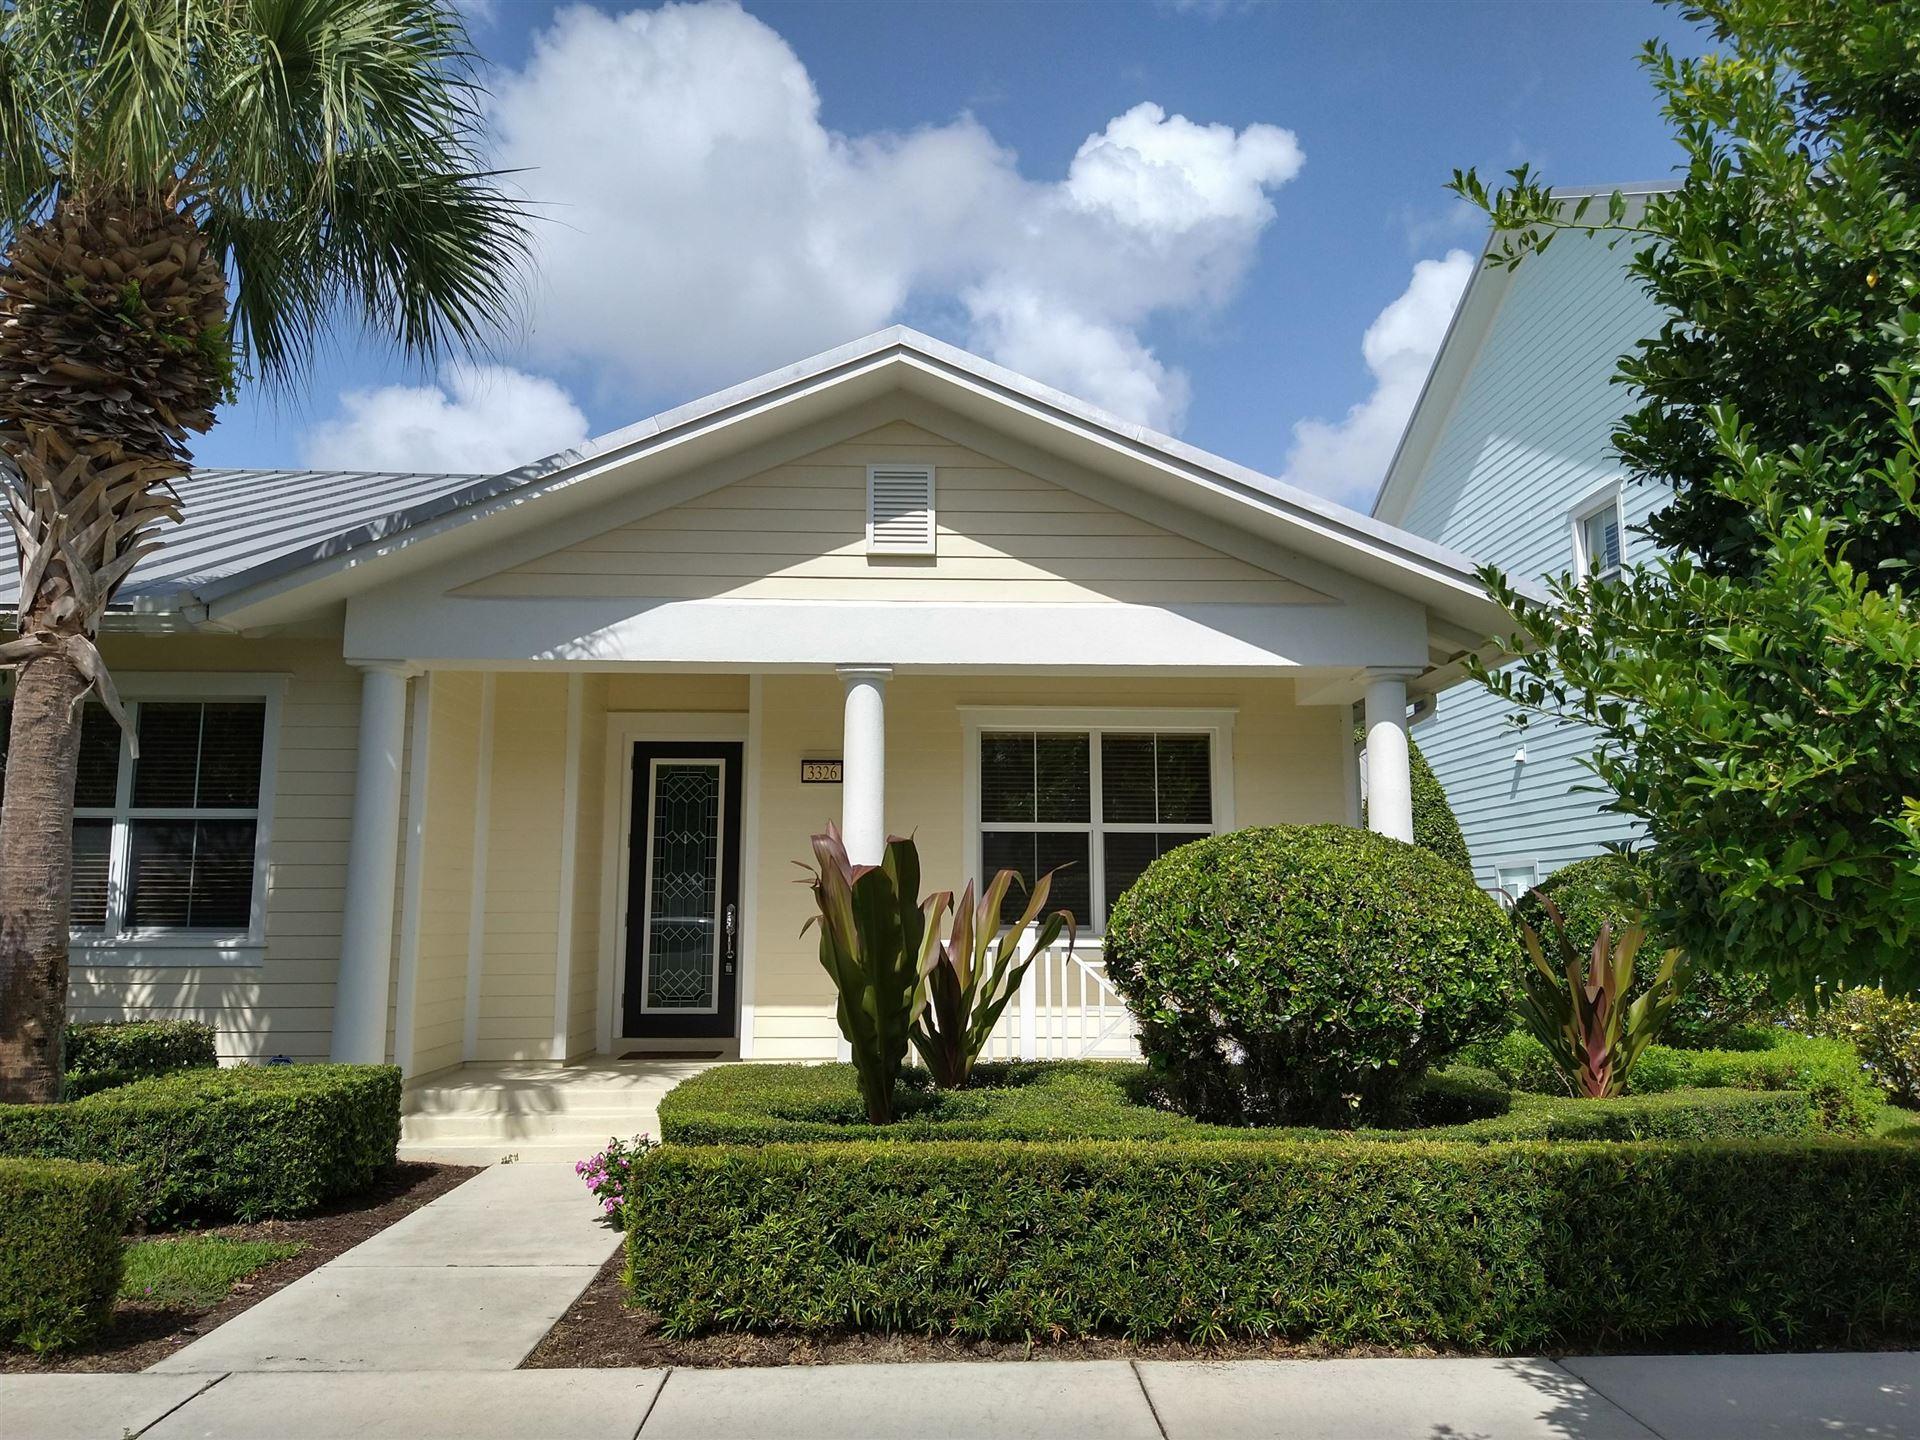 Photo of 3326 Josephine Street, Jupiter, FL 33458 (MLS # RX-10653046)